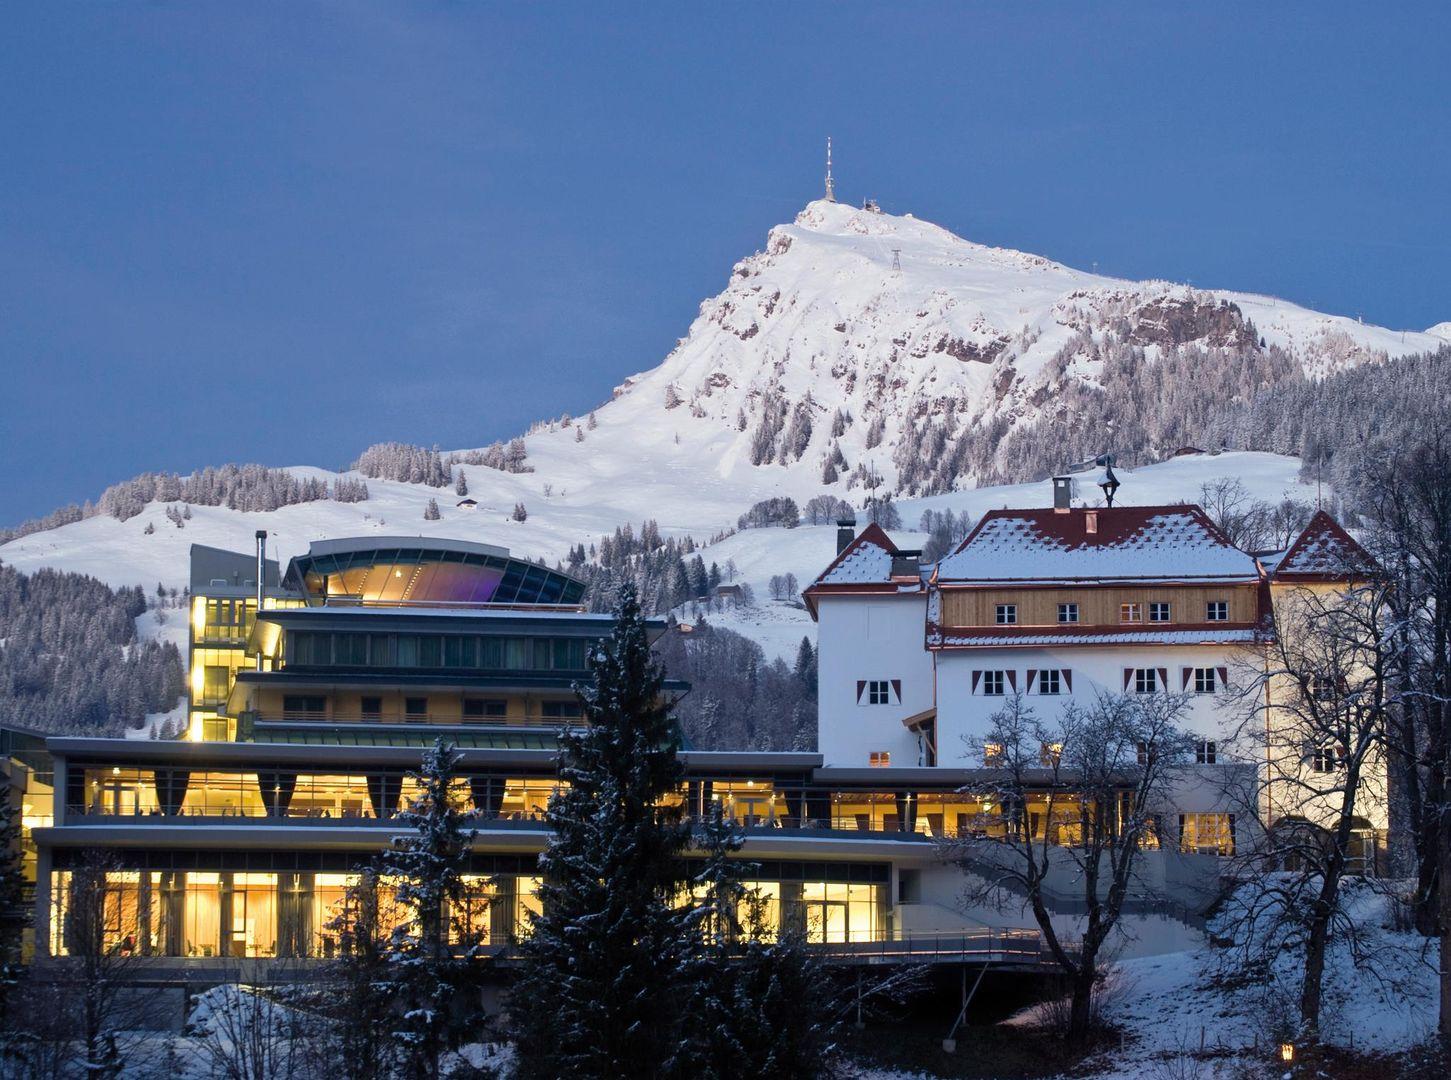 Lebenberg Schlosshotel - Slide 1